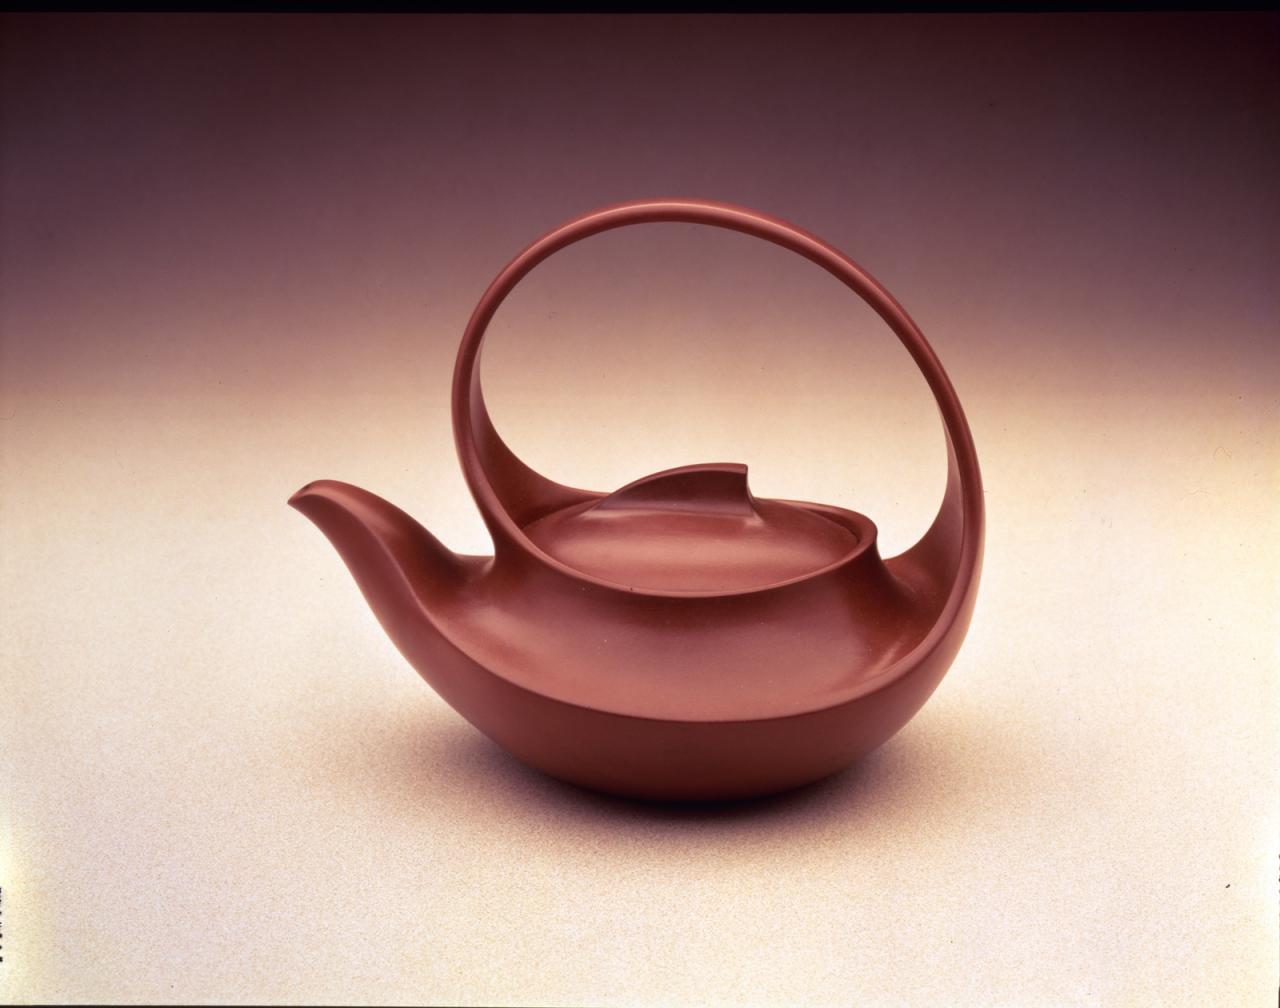 Wang Yinxian, Zhang Shouzhi 'Large teapot with ribbed decoration and overhead handle' image